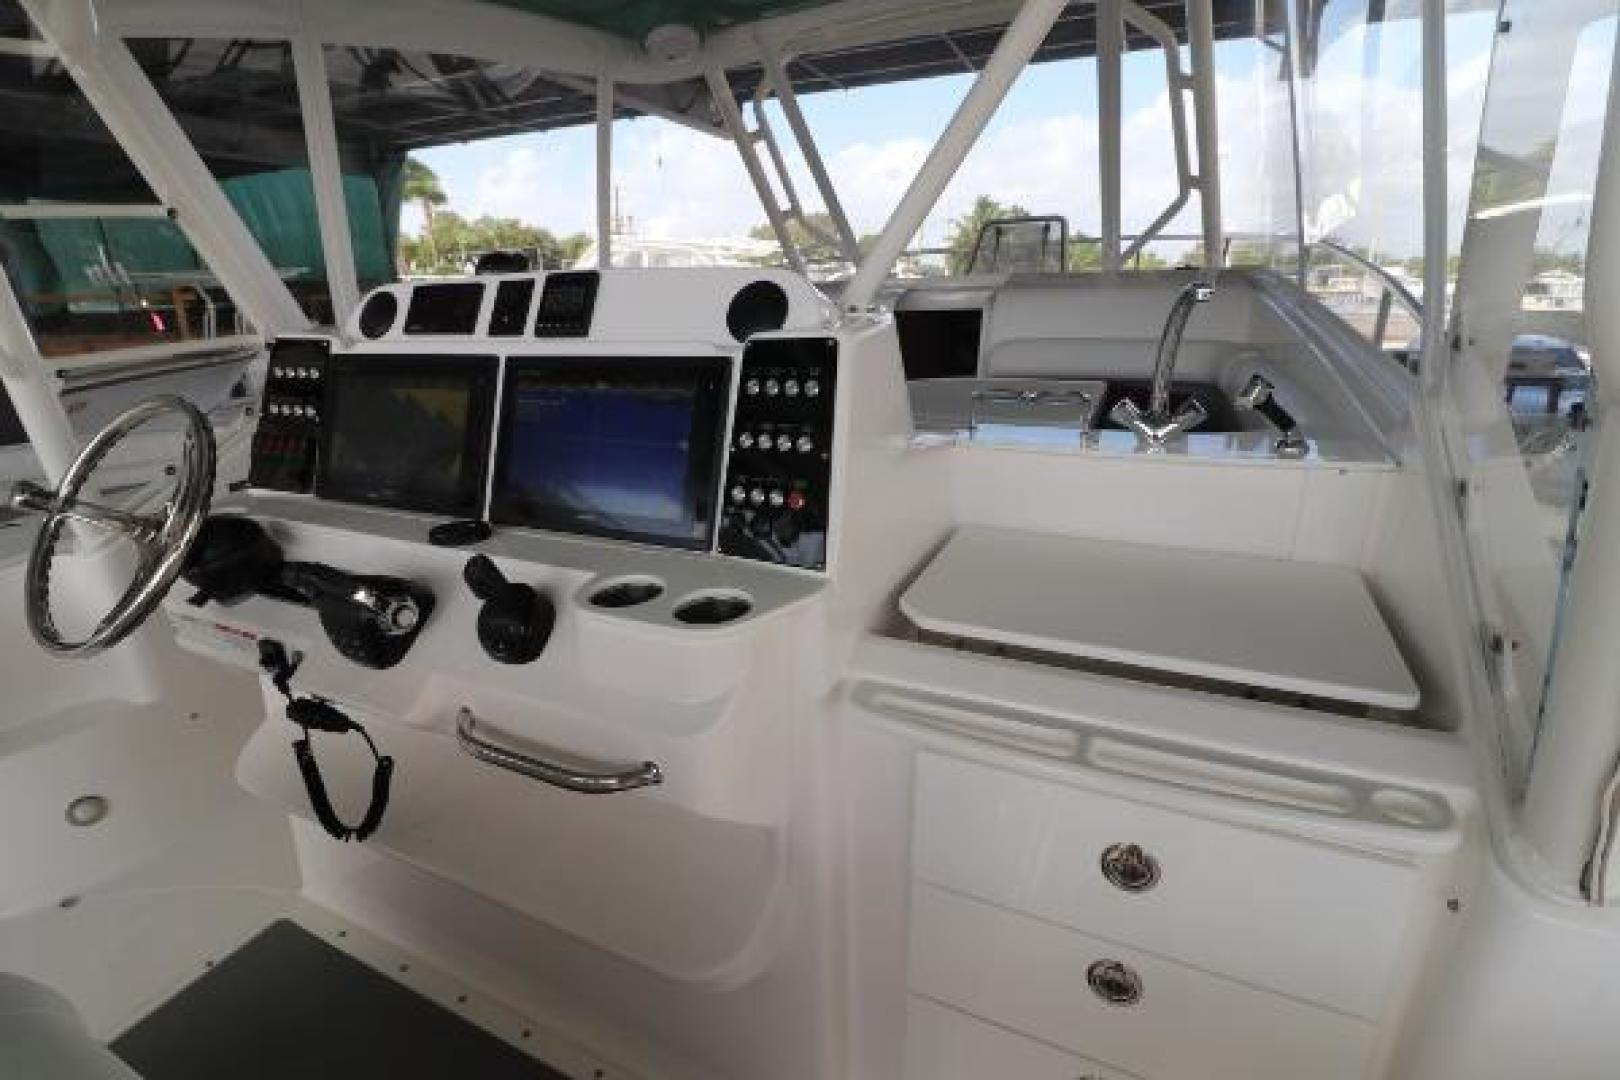 Everglades-350LX 2016-Everglades 350LX Fort Lauderdale-Florida-United States-1530991 | Thumbnail